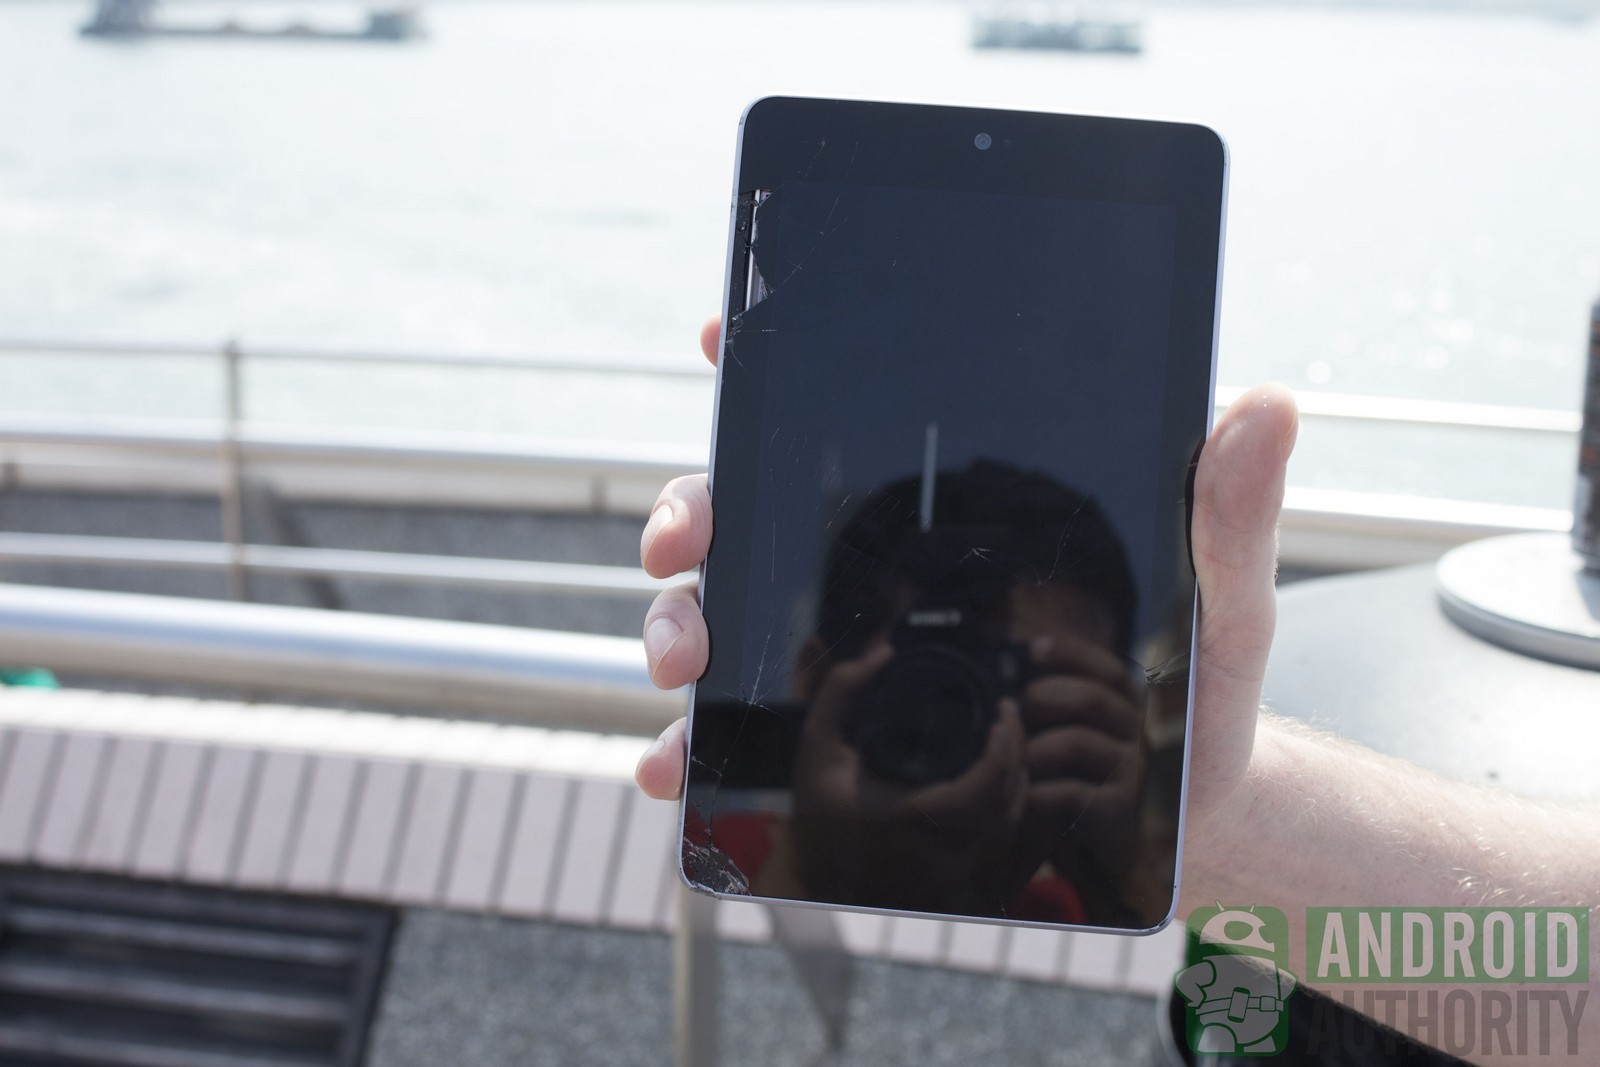 iPad mini vs. Nexus 7, crash test (Android Authority)